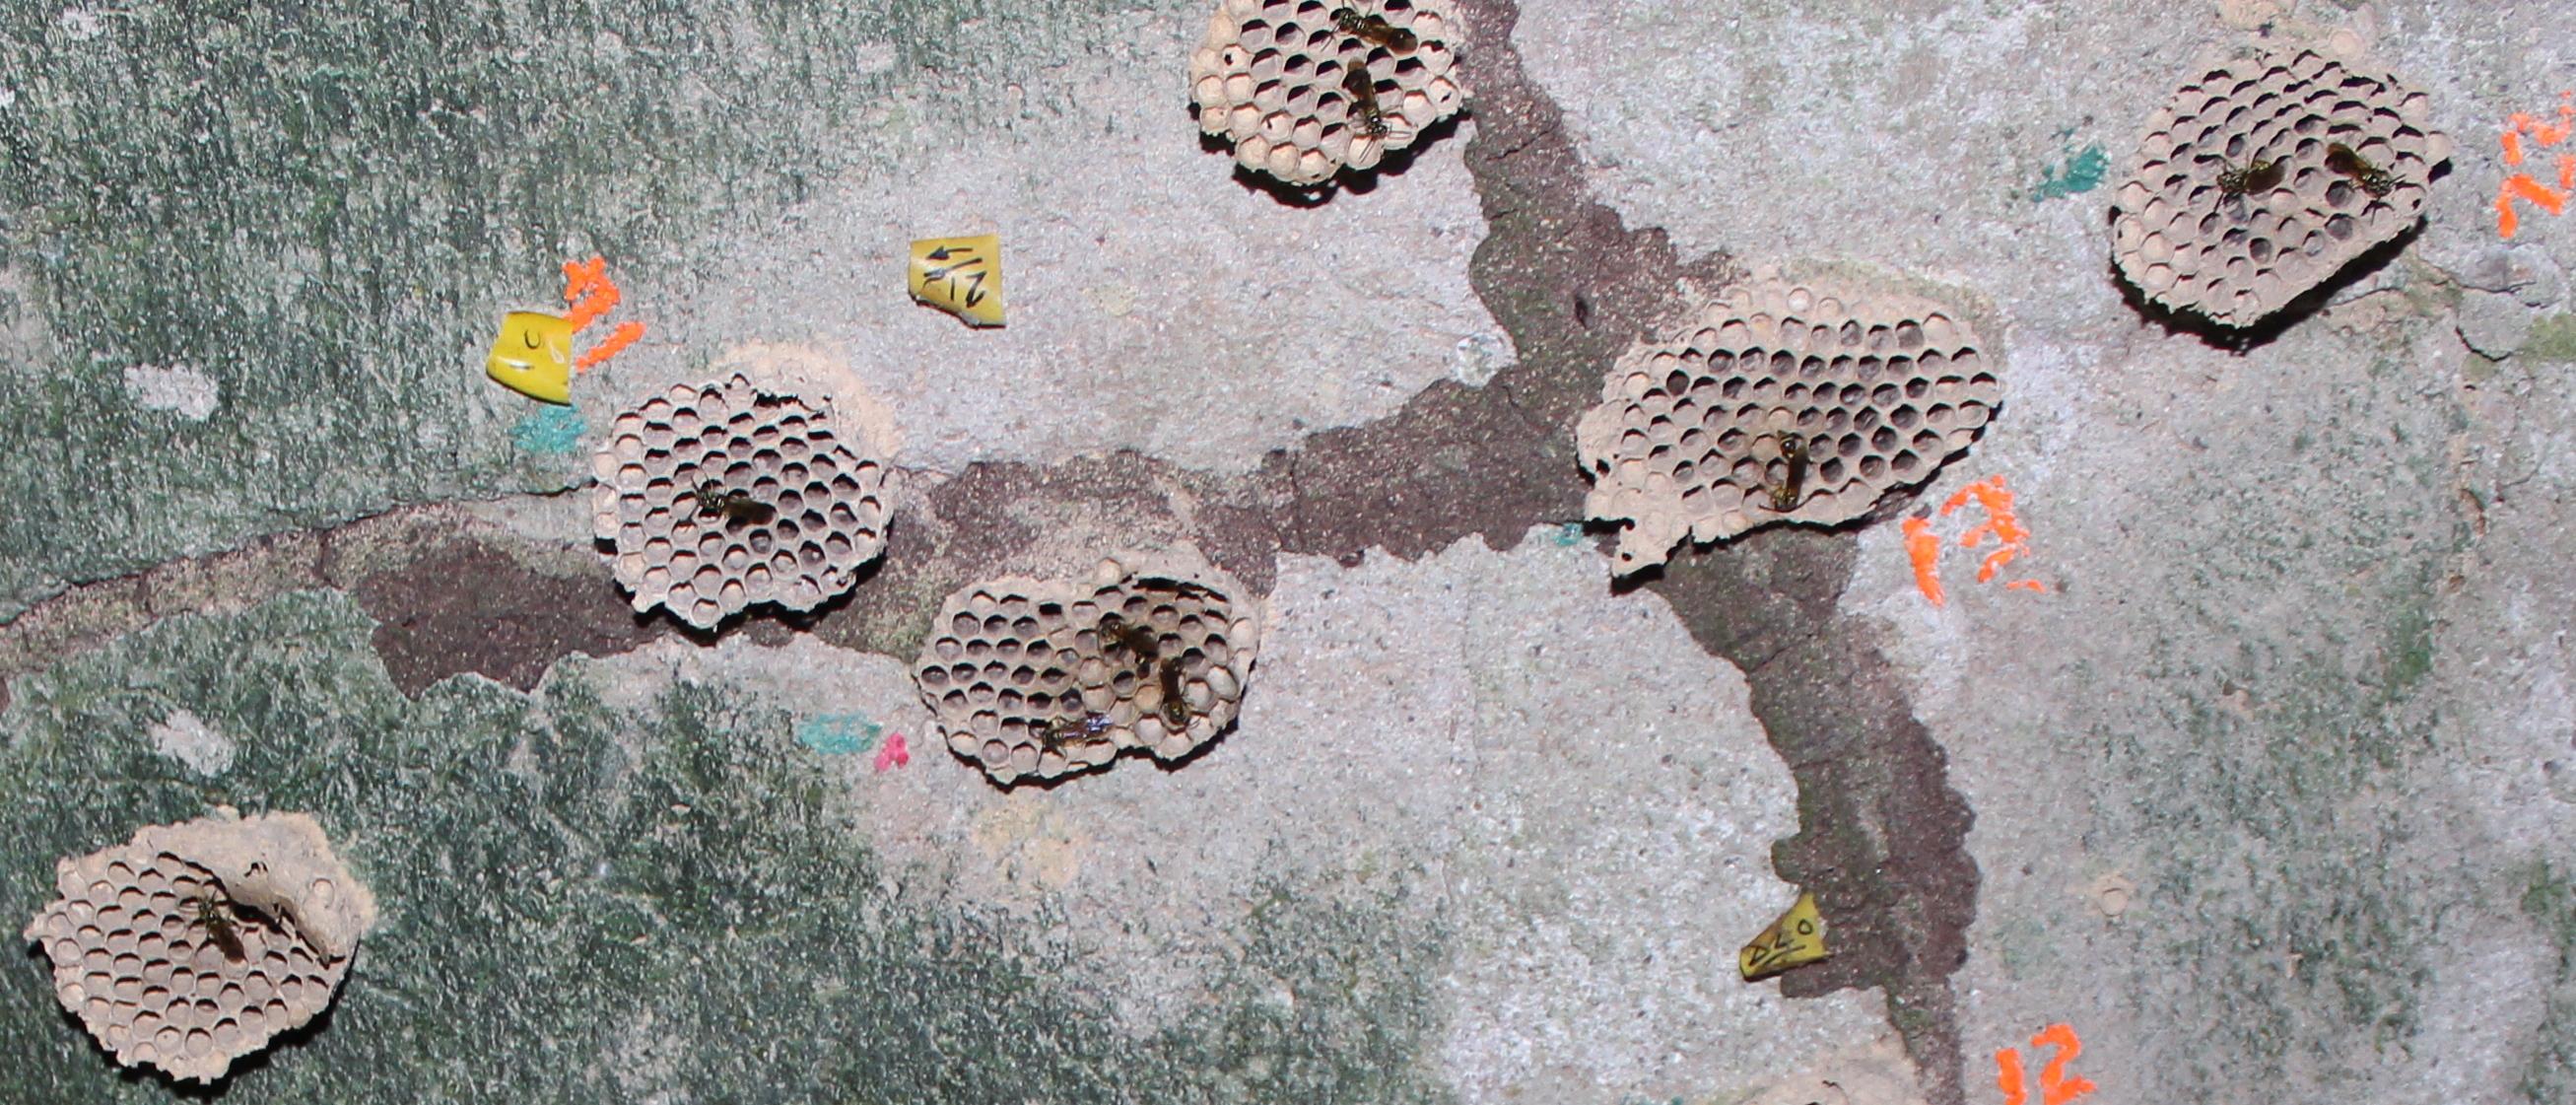 LF nest aggregation croppd